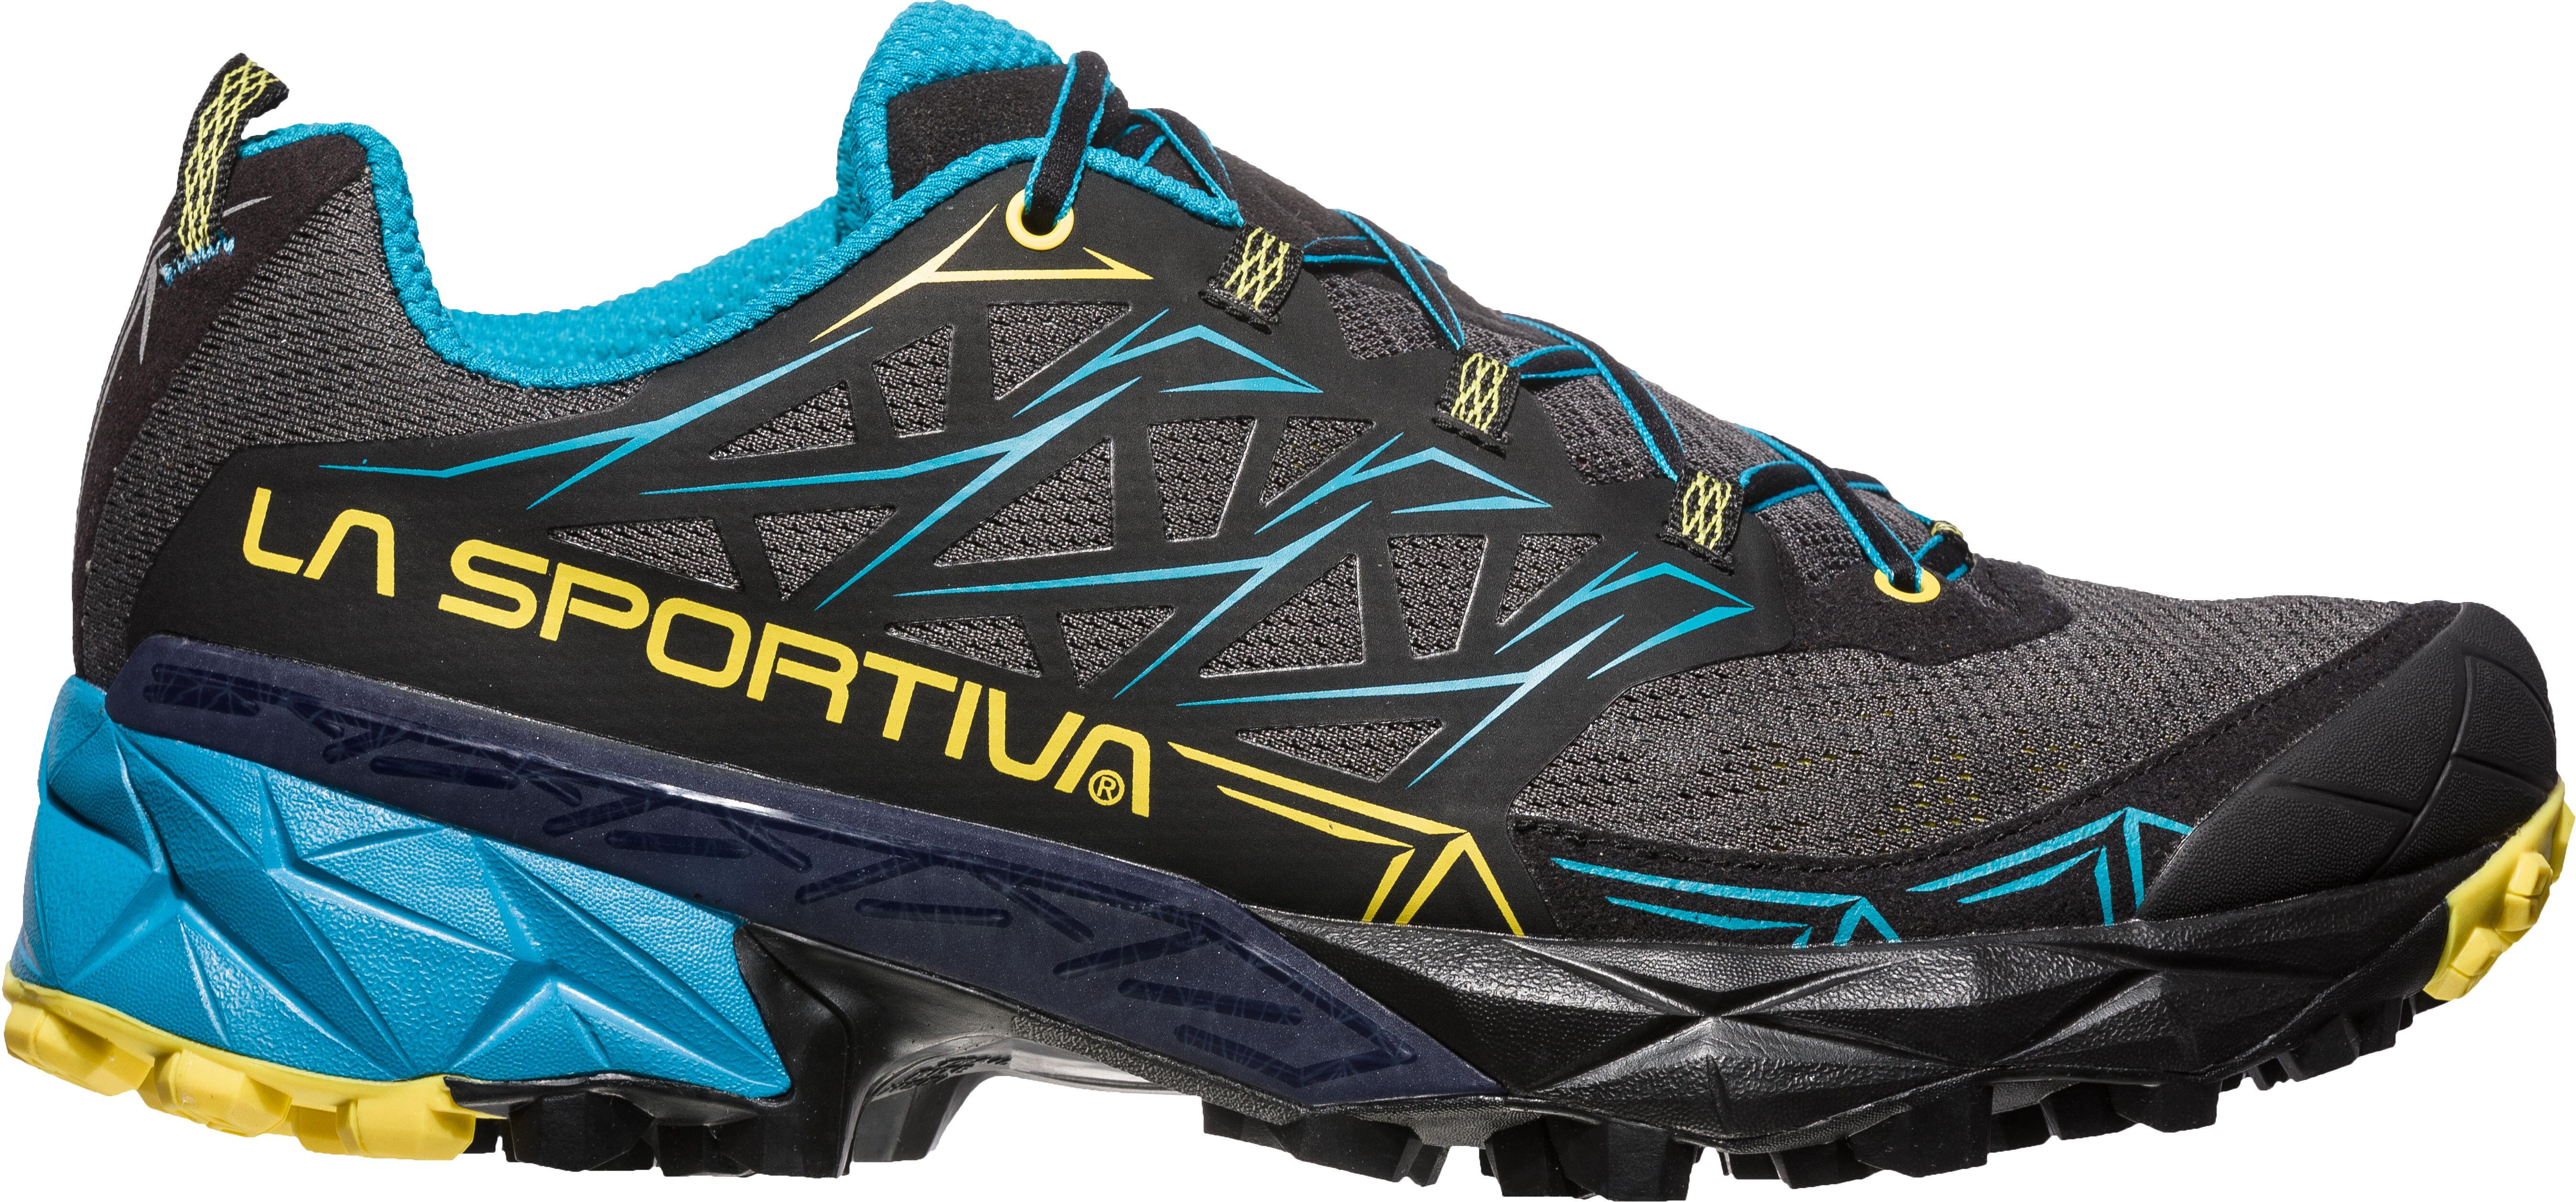 premium selection 5f5d0 9390c La Sportiva Akyra - Zapatillas running Hombre - gris azul